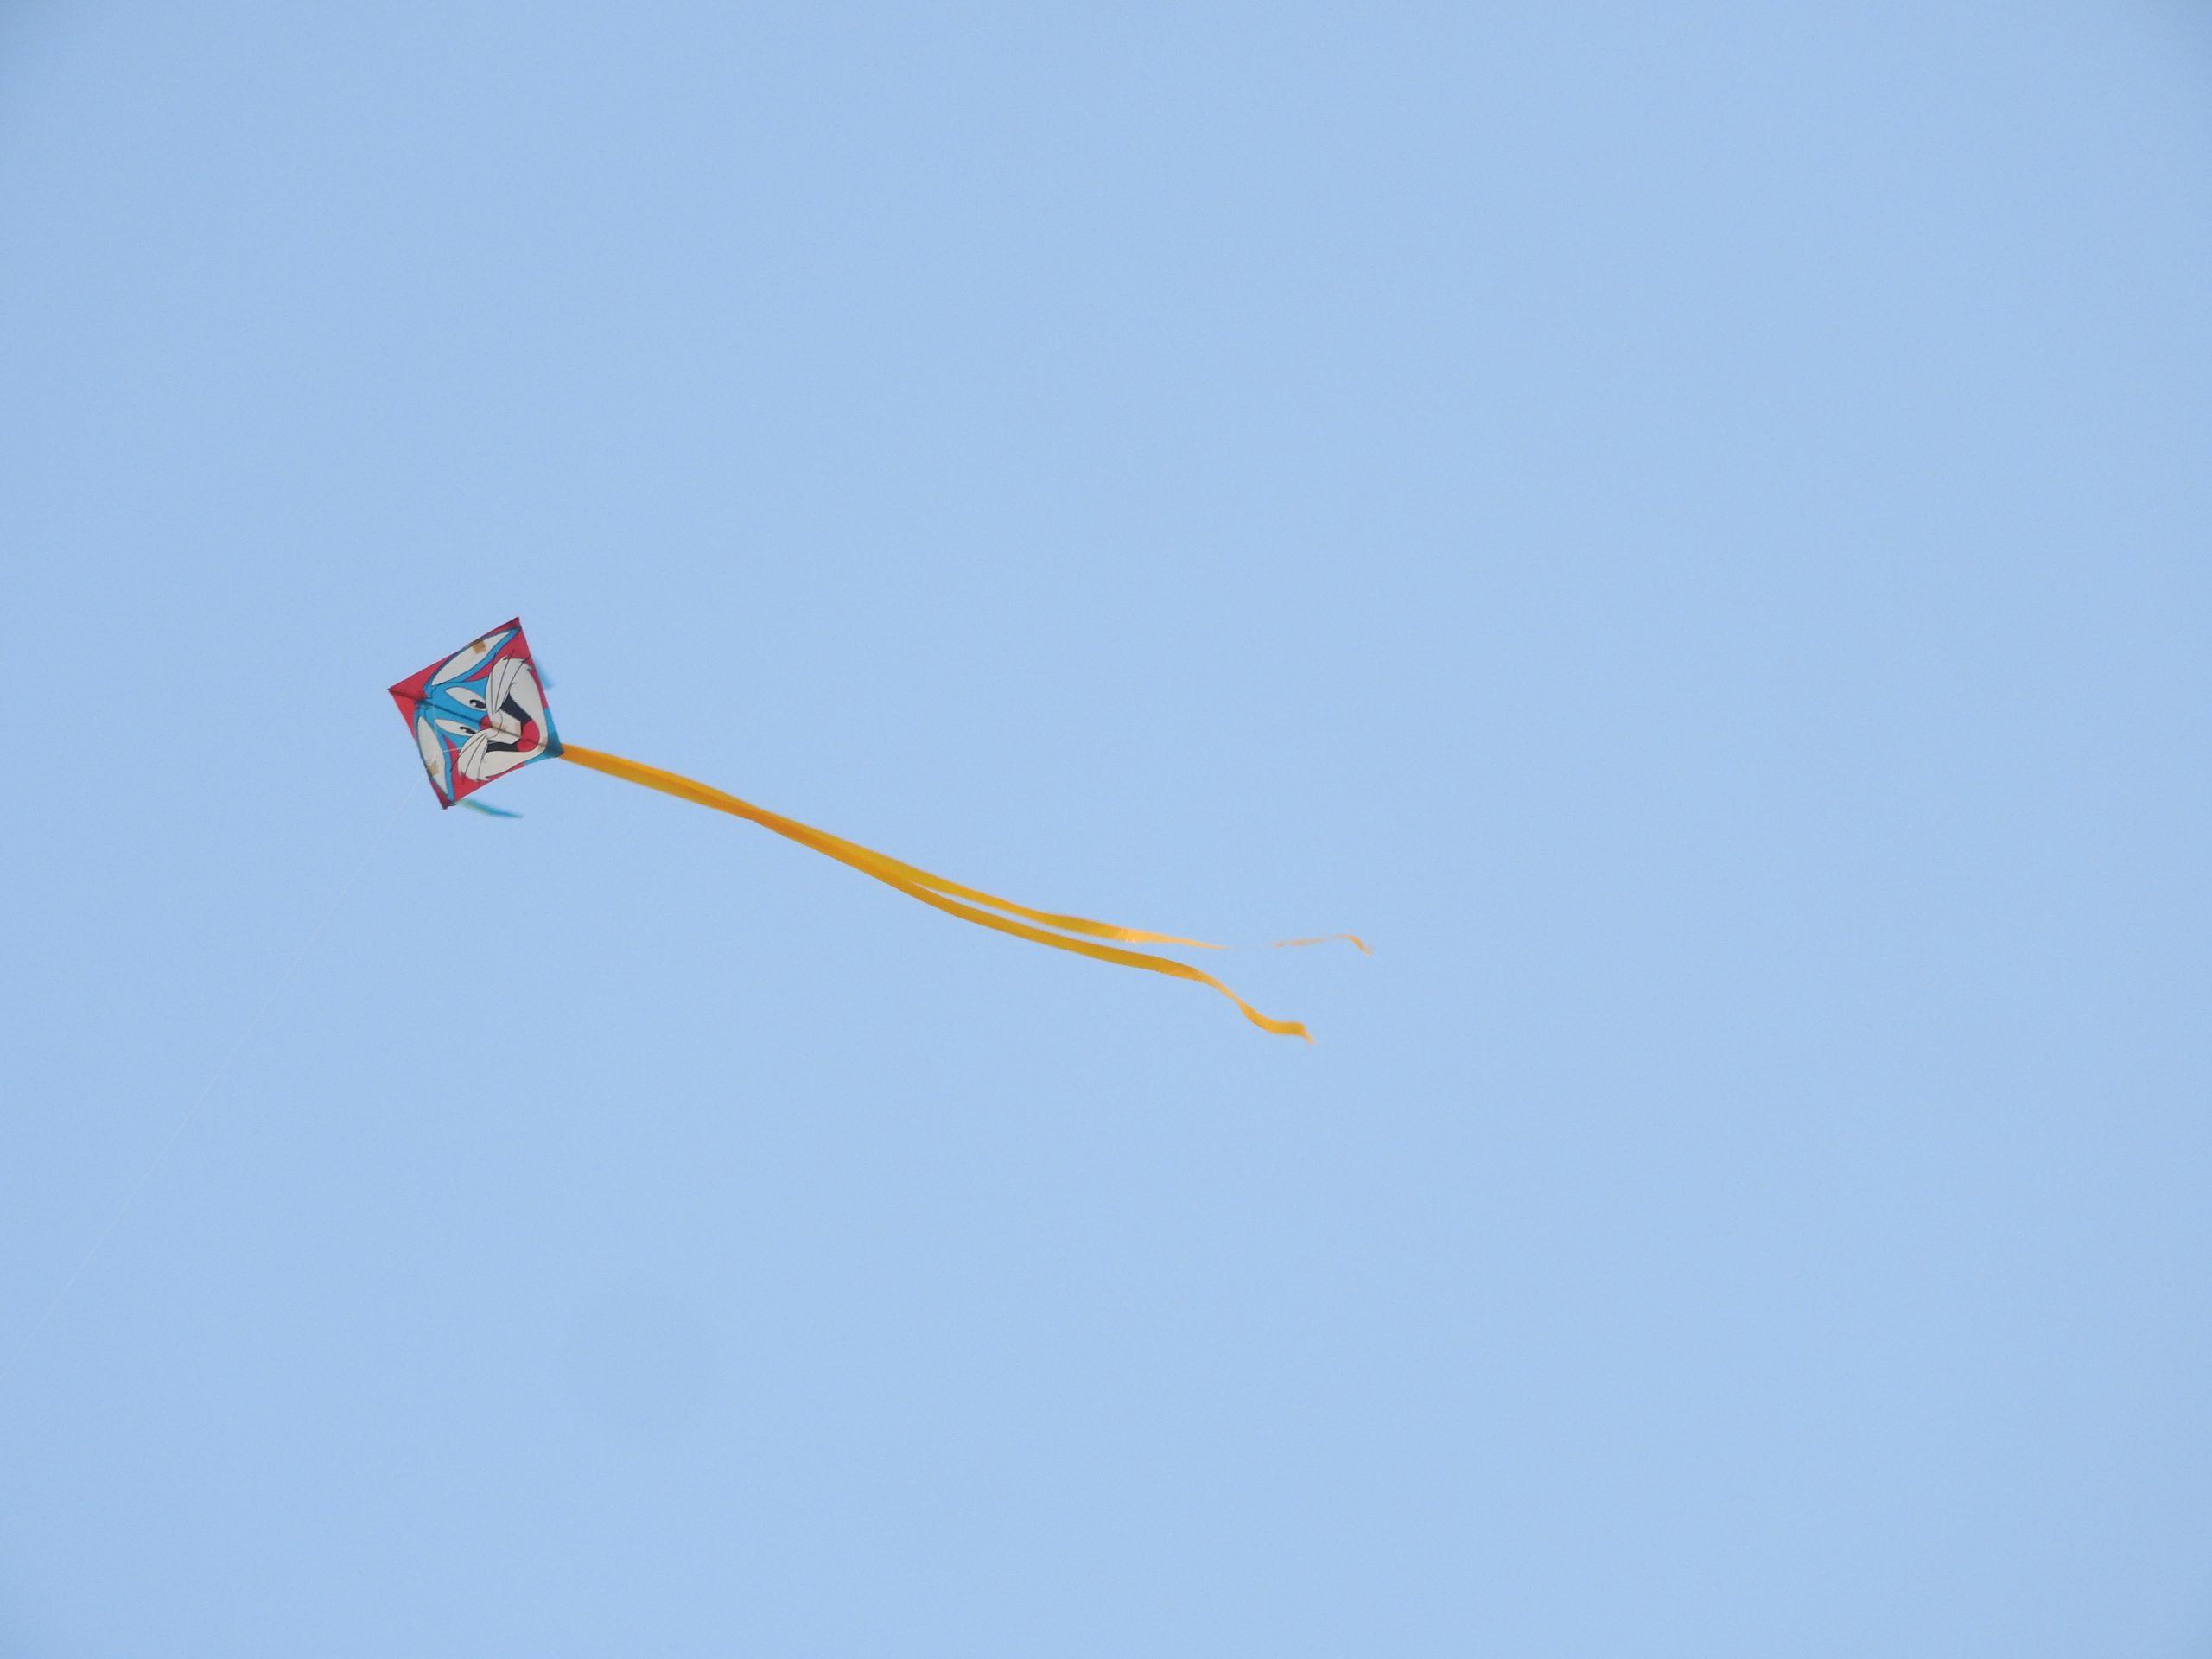 Kite flying high in the sky